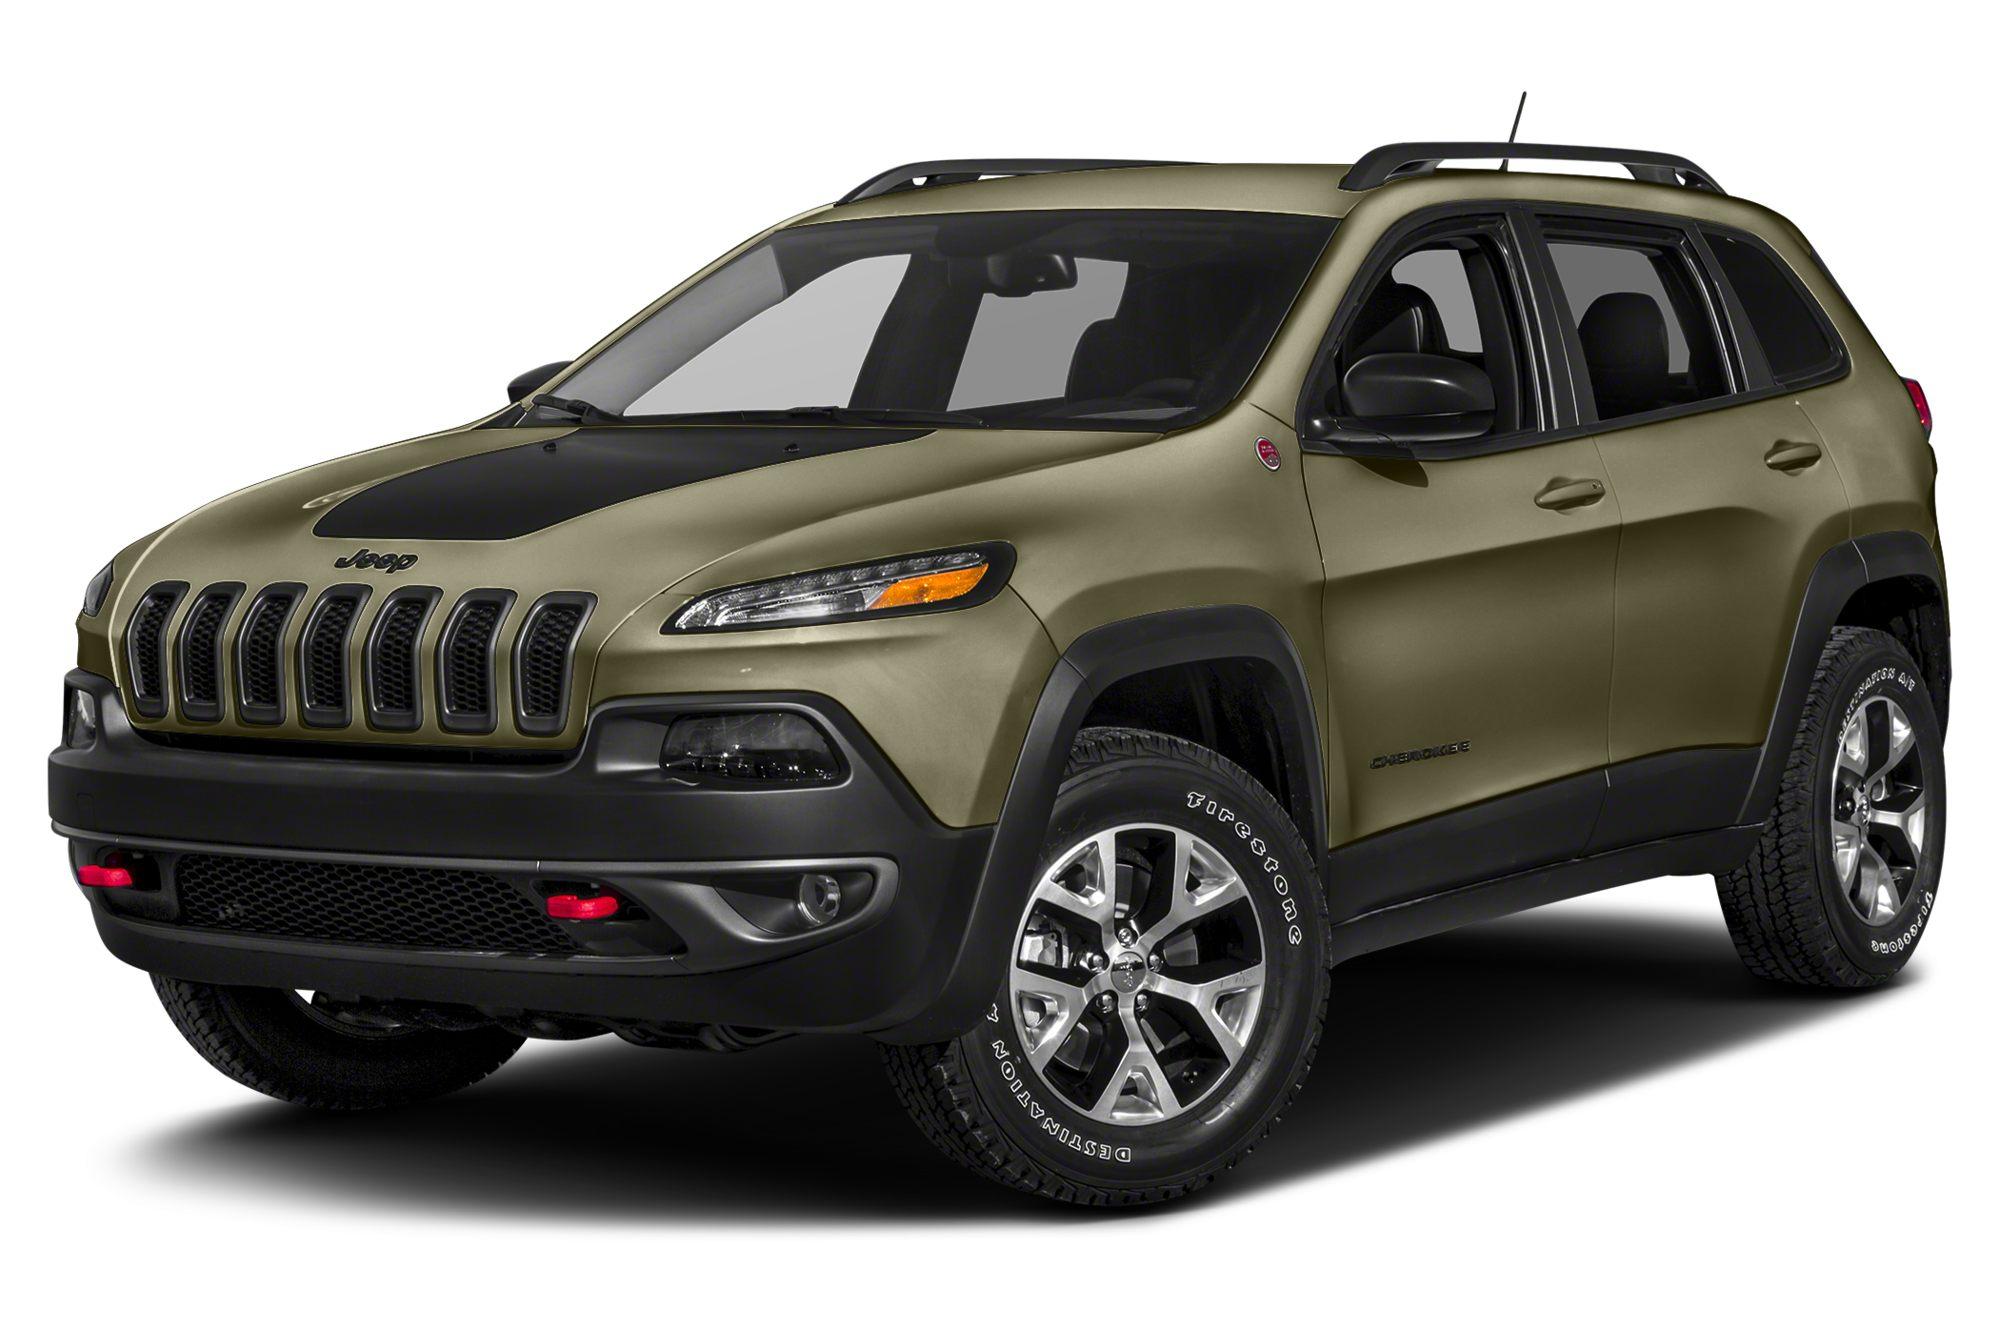 2014-2017 Jeep Cherokee: Recall Alert